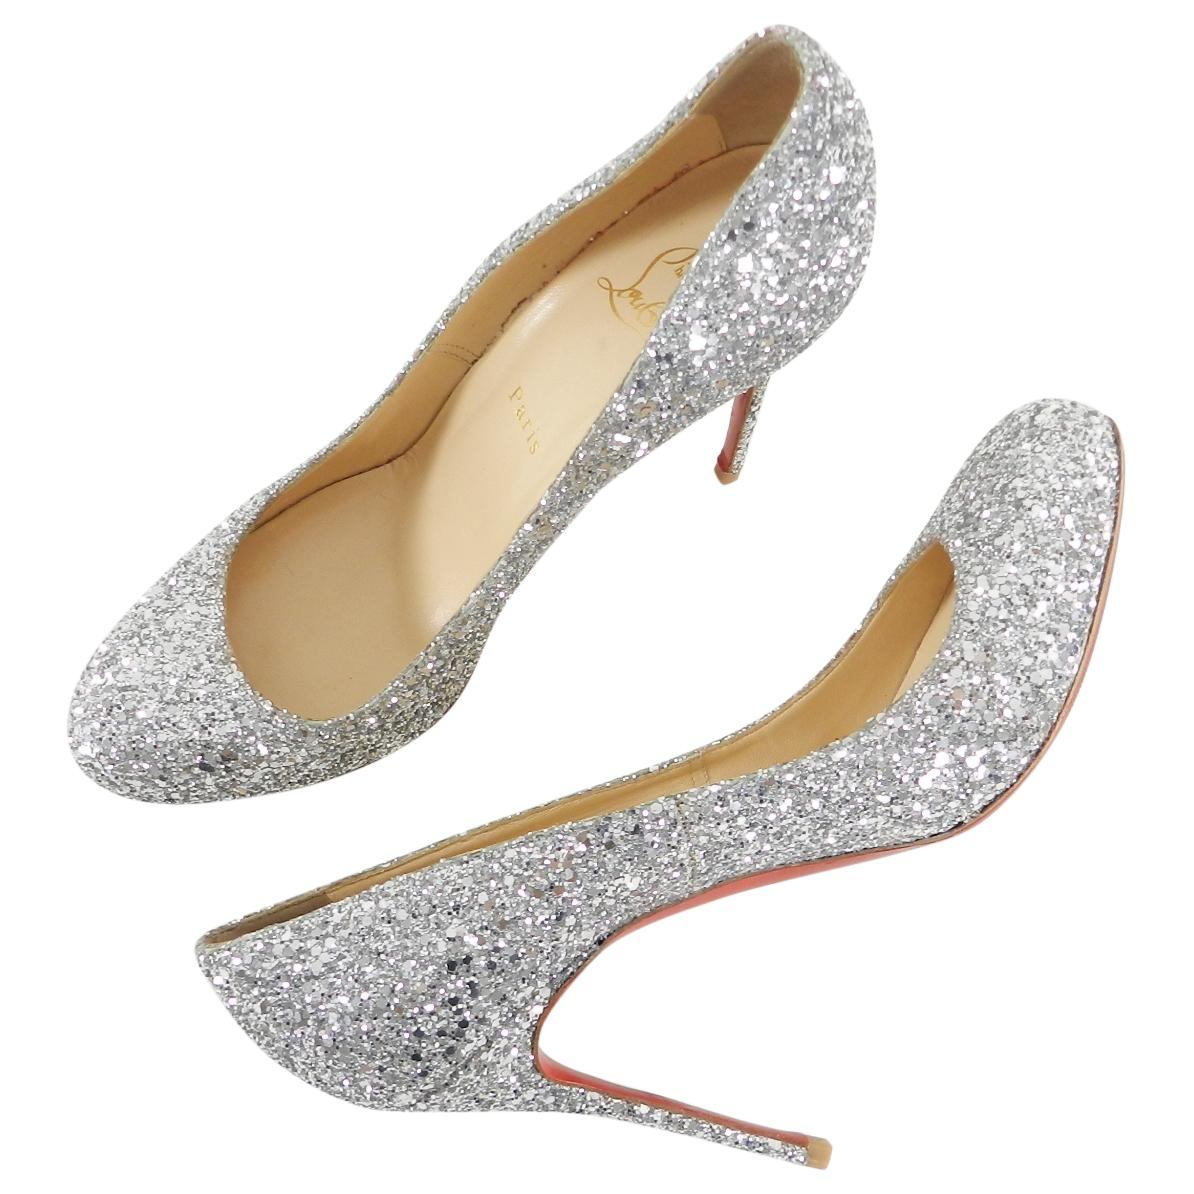 buy online a2659 aead6 110 Sparkle Pumps Glitter Christian Louboutin Heels Silver ...